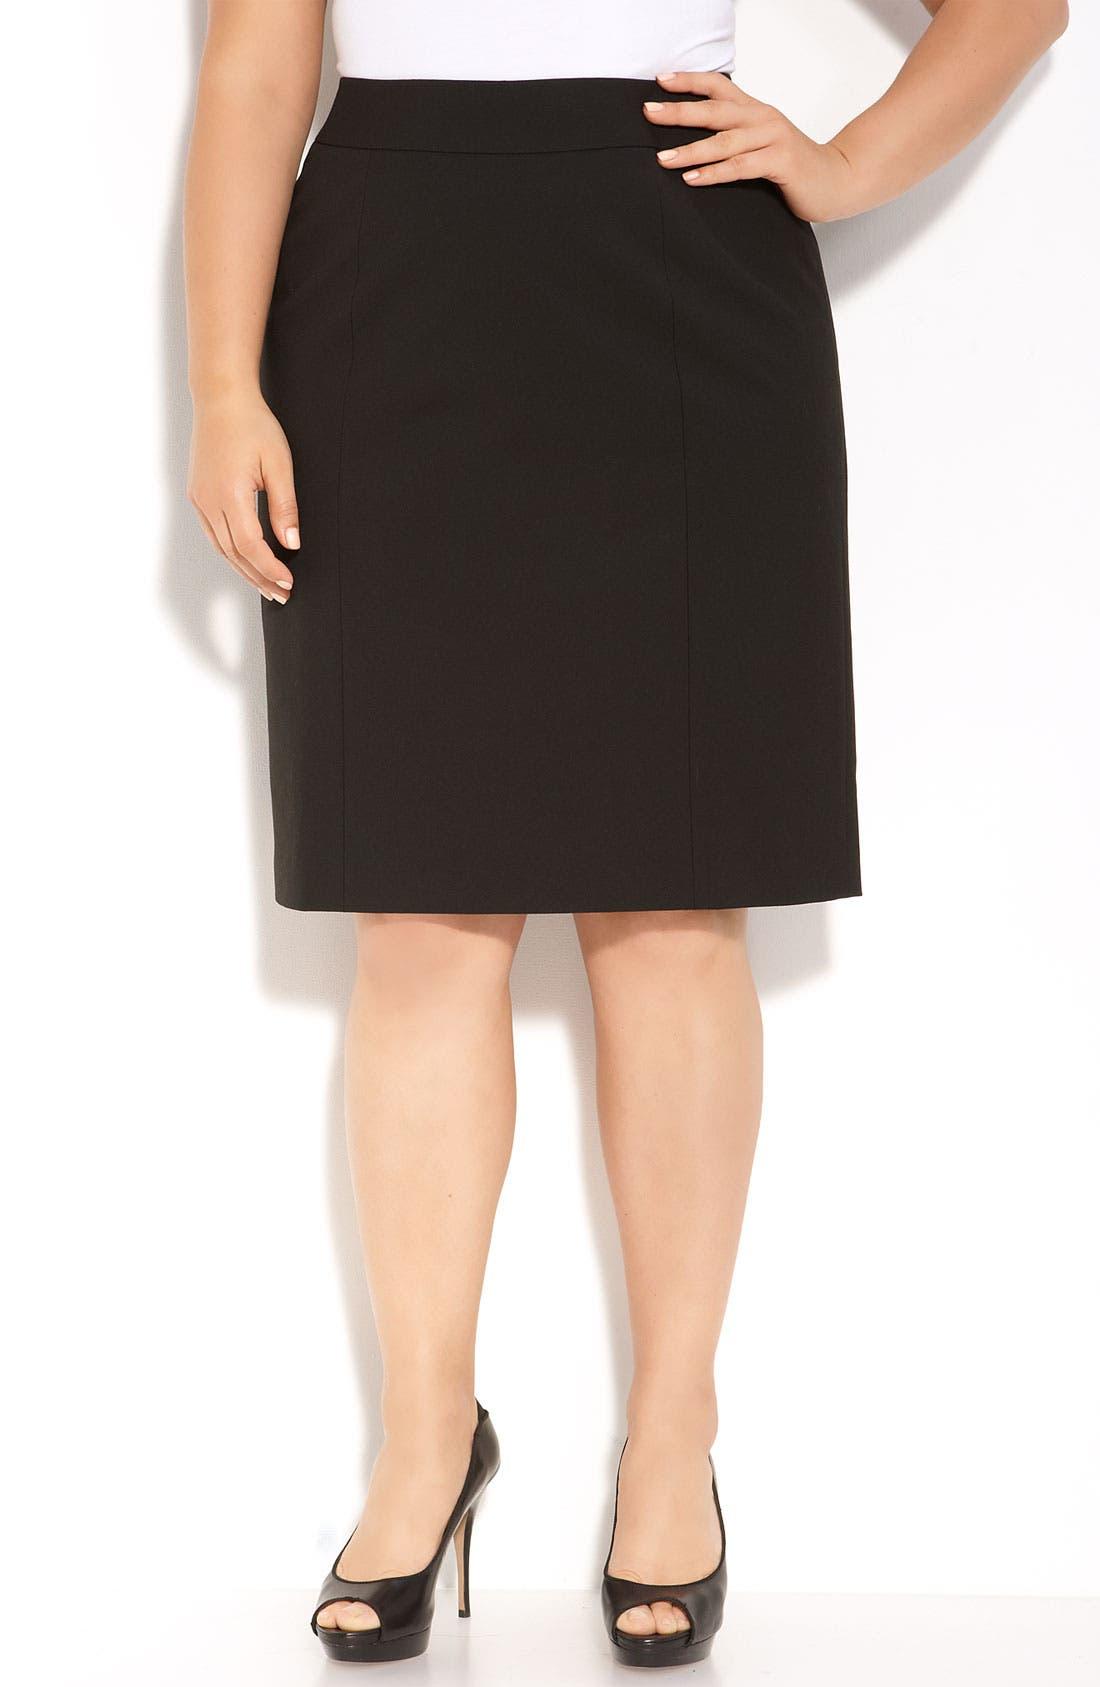 Alternate Image 1 Selected - Sejour 'Ela' Pencil Skirt (Plus)